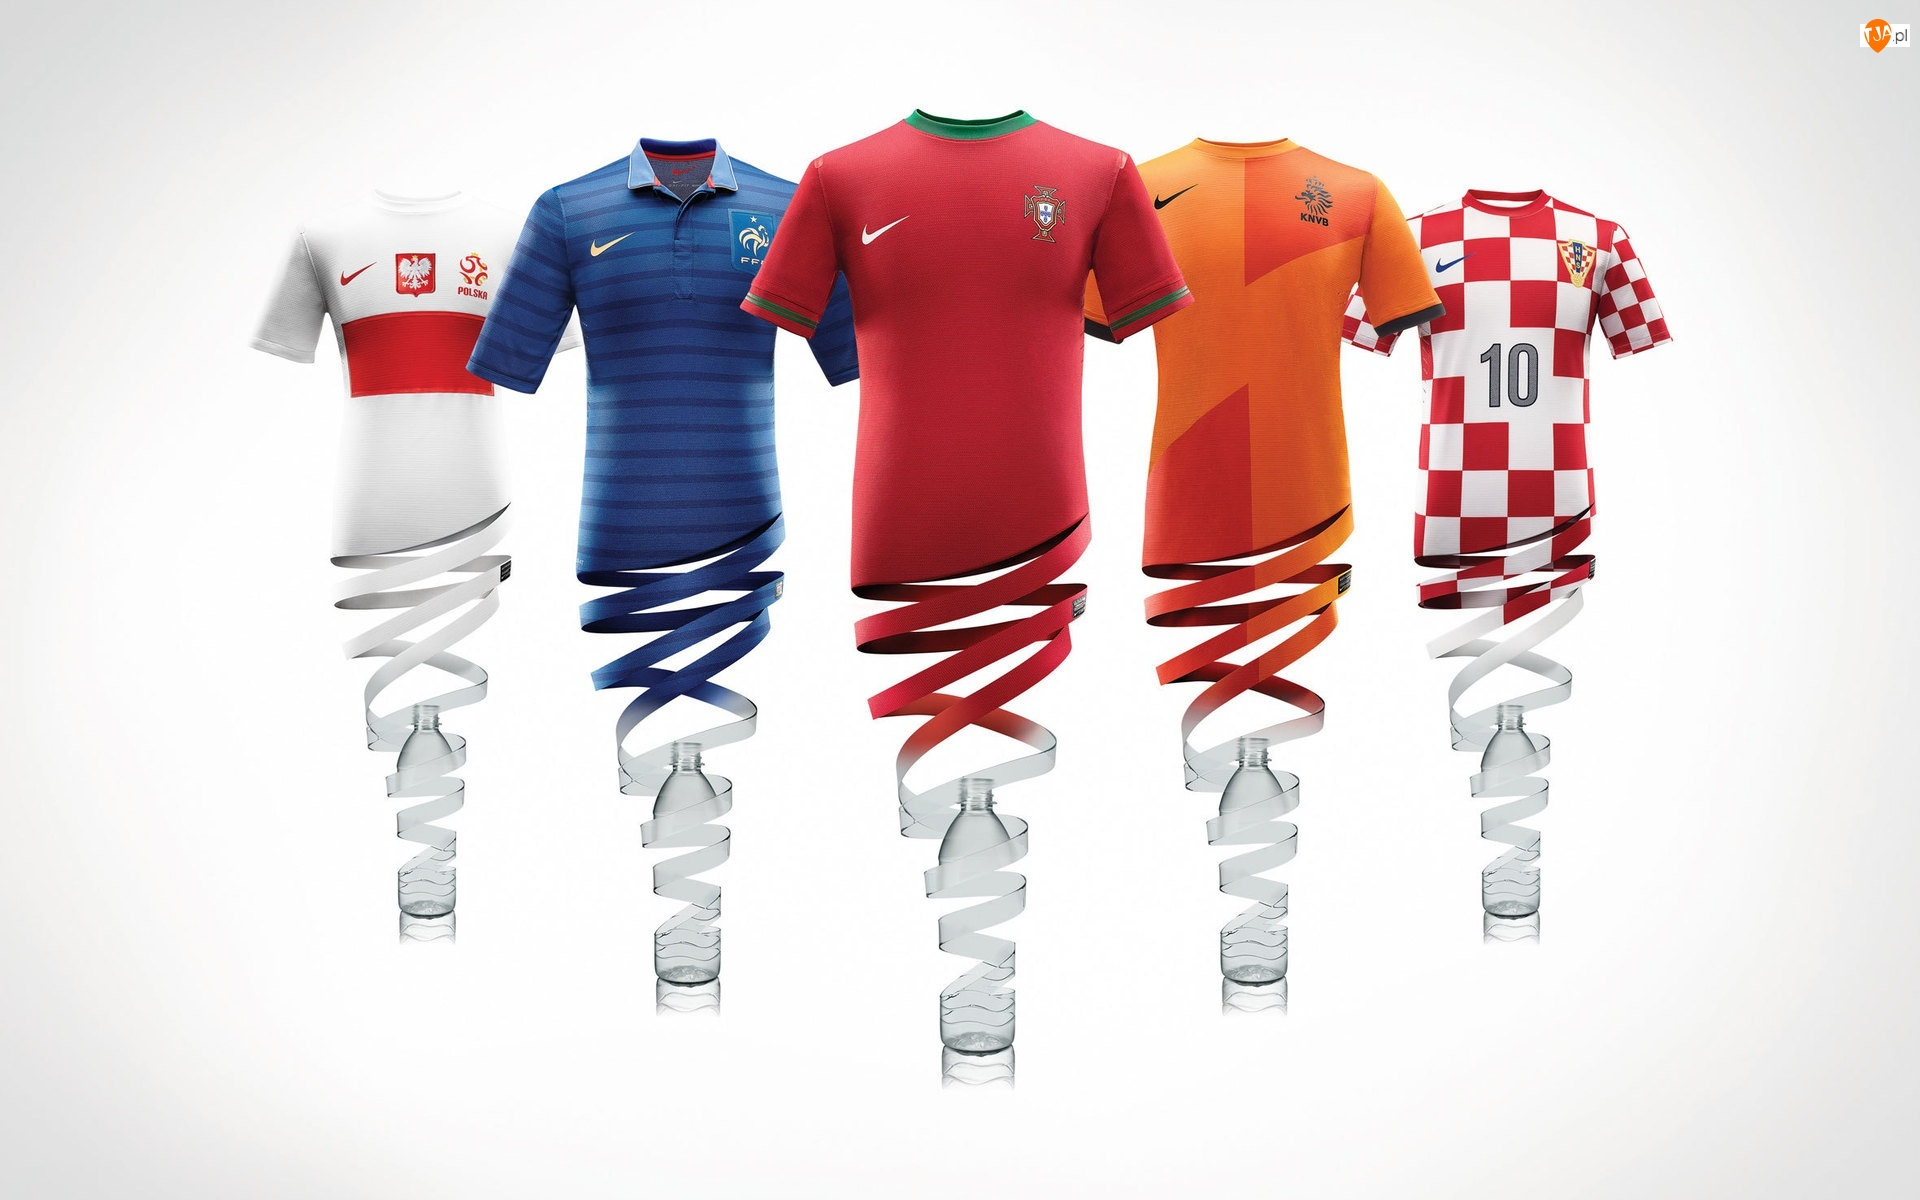 Euro 2012, Koszulki, Piłkarzy